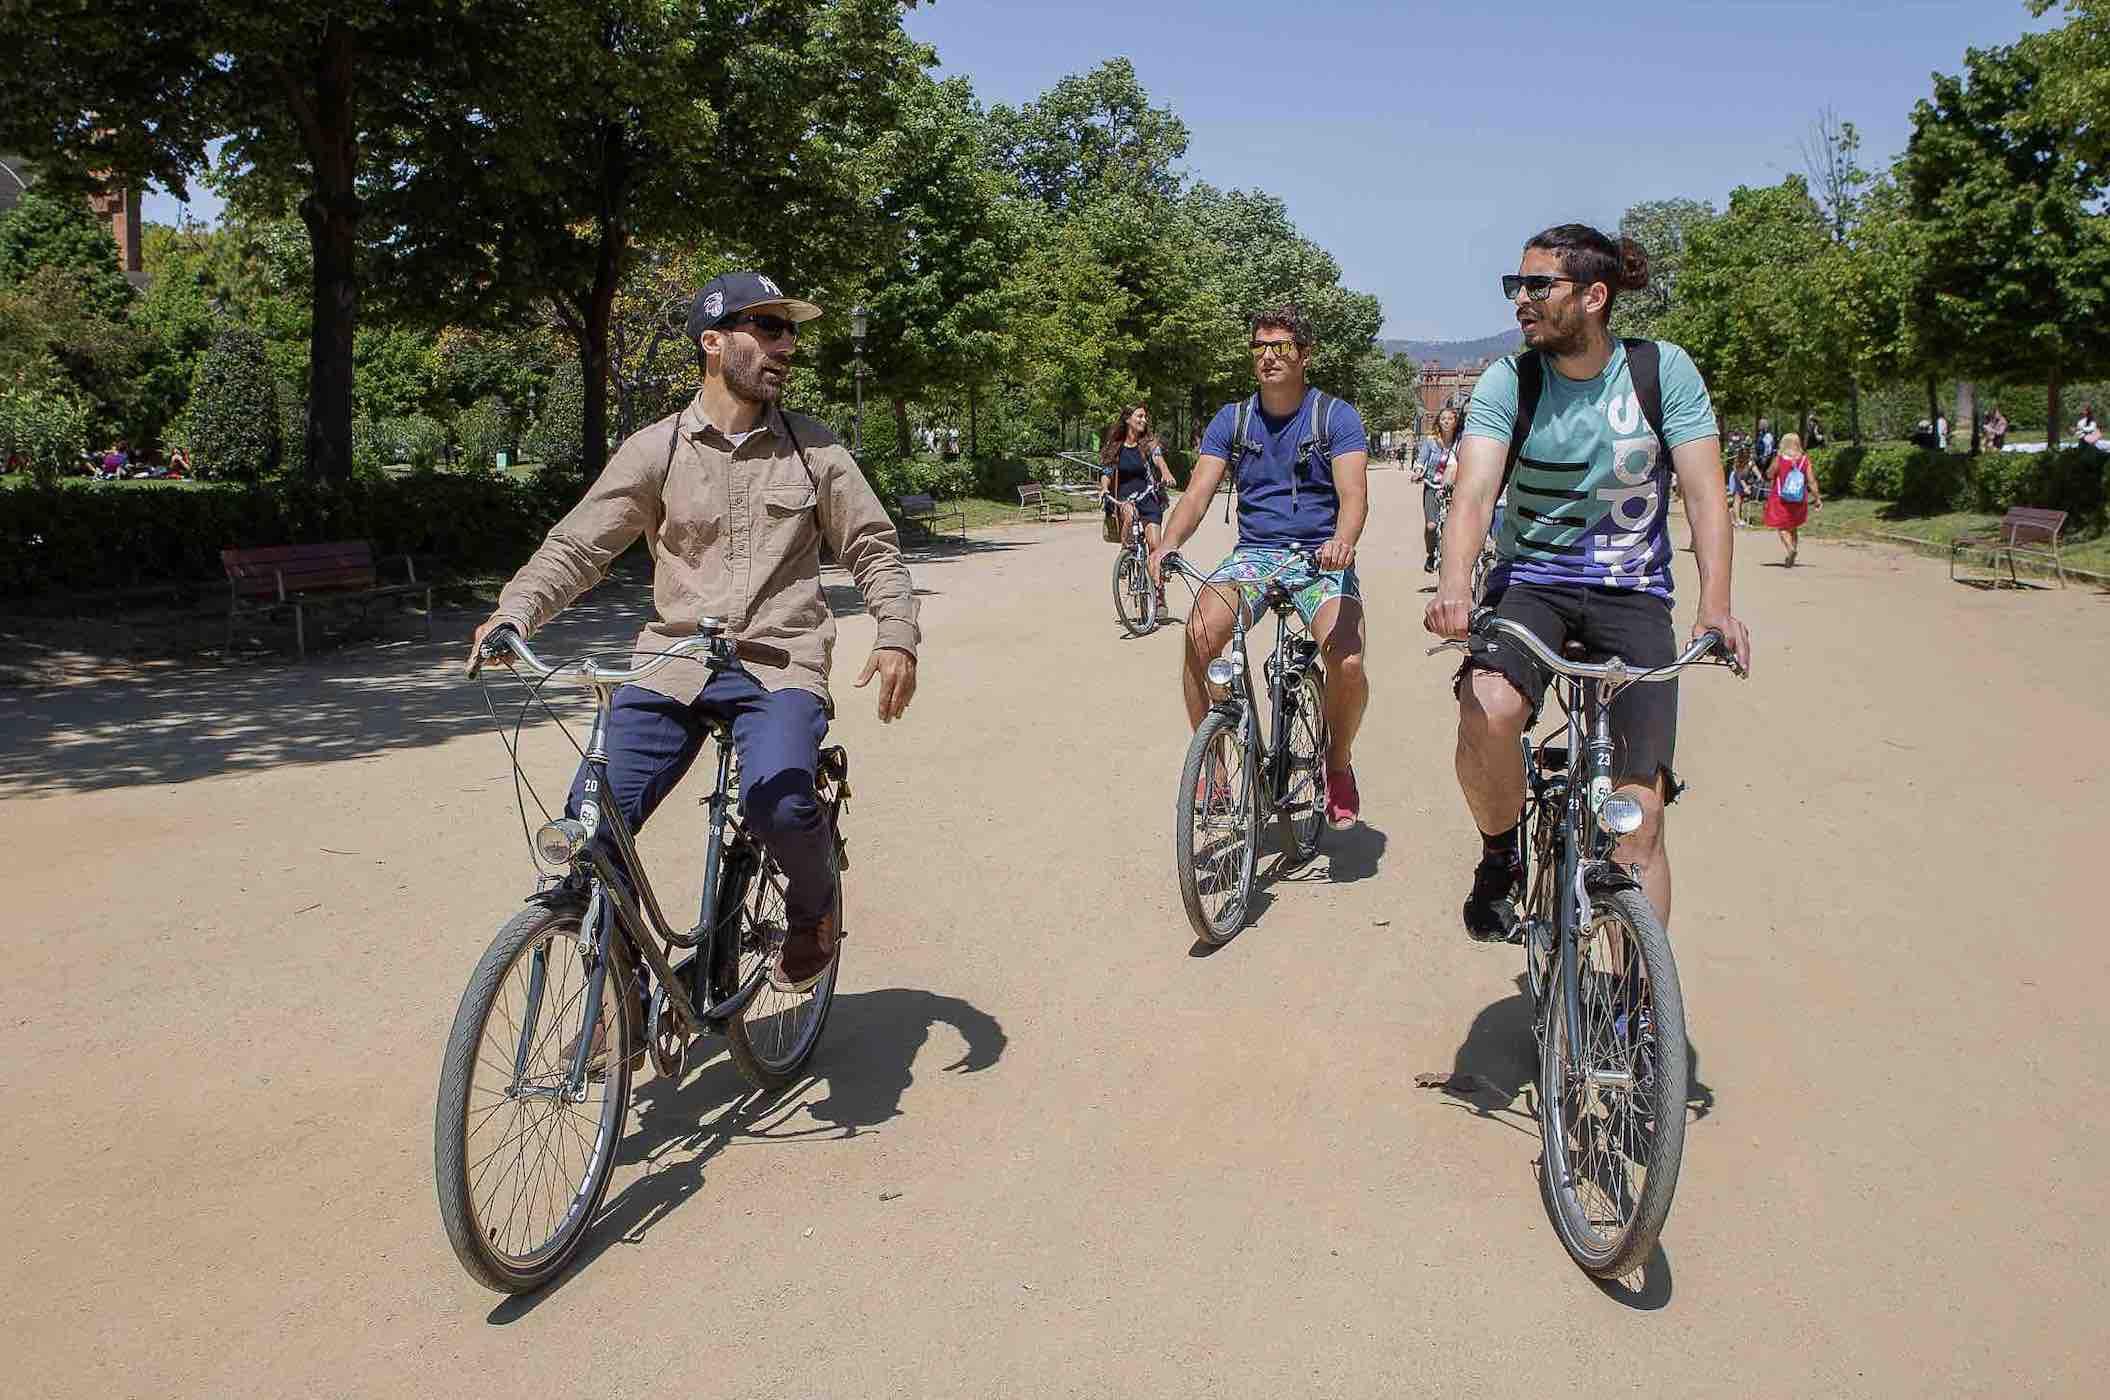 Cyclists on the BArcelona boardwalk